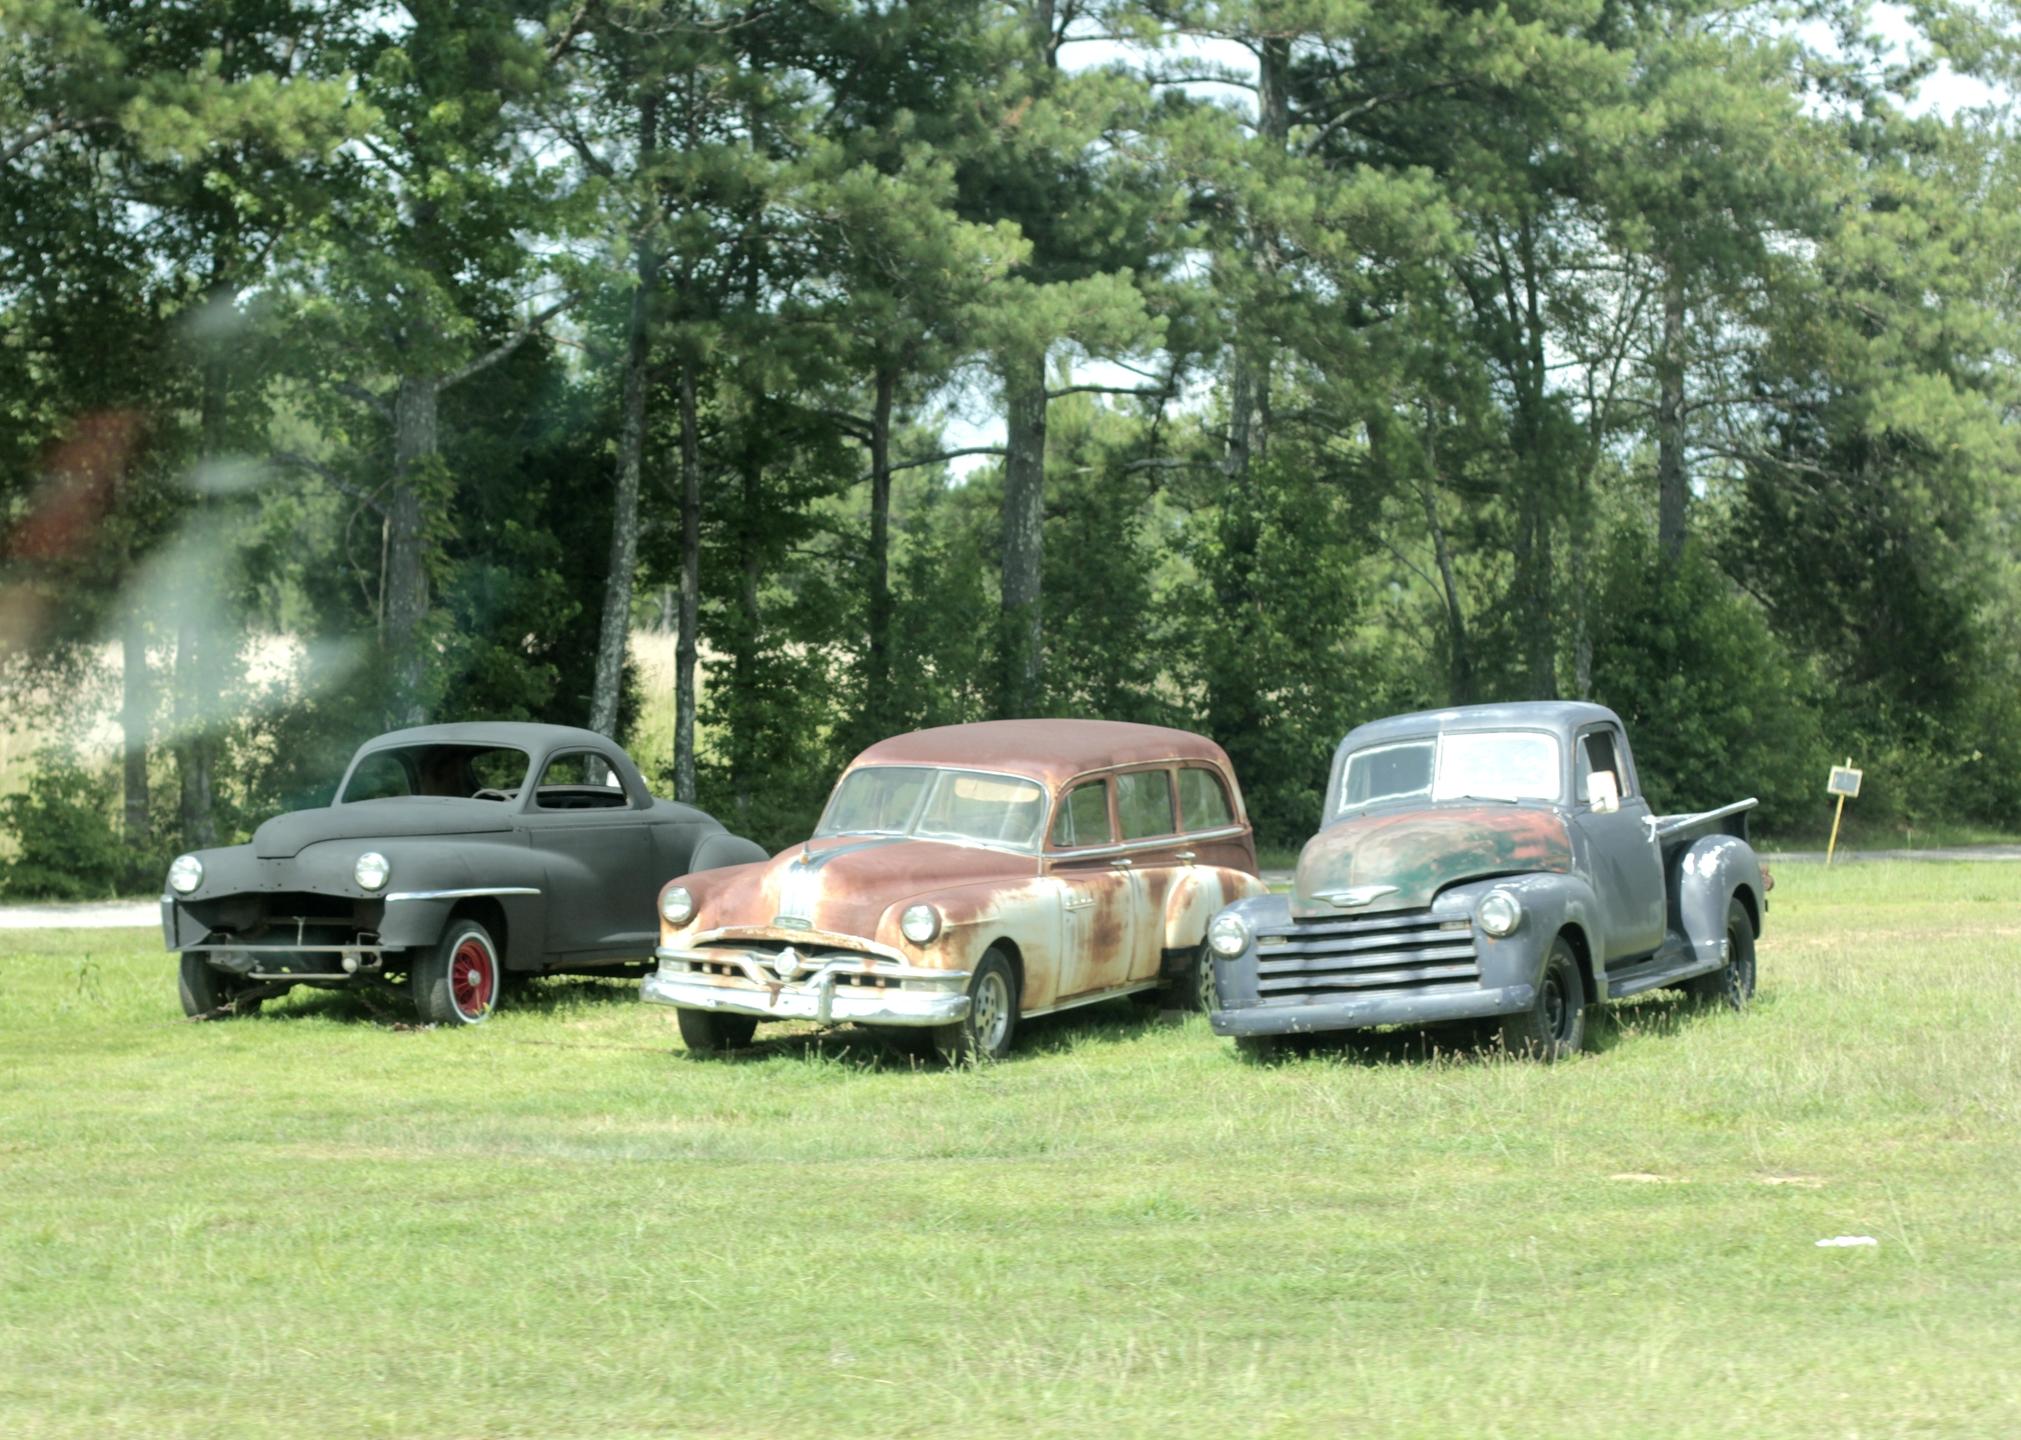 old-cars-land-vehicle-vehicle-car-motor-vehicle-classic-car-1593481-pxhere.com